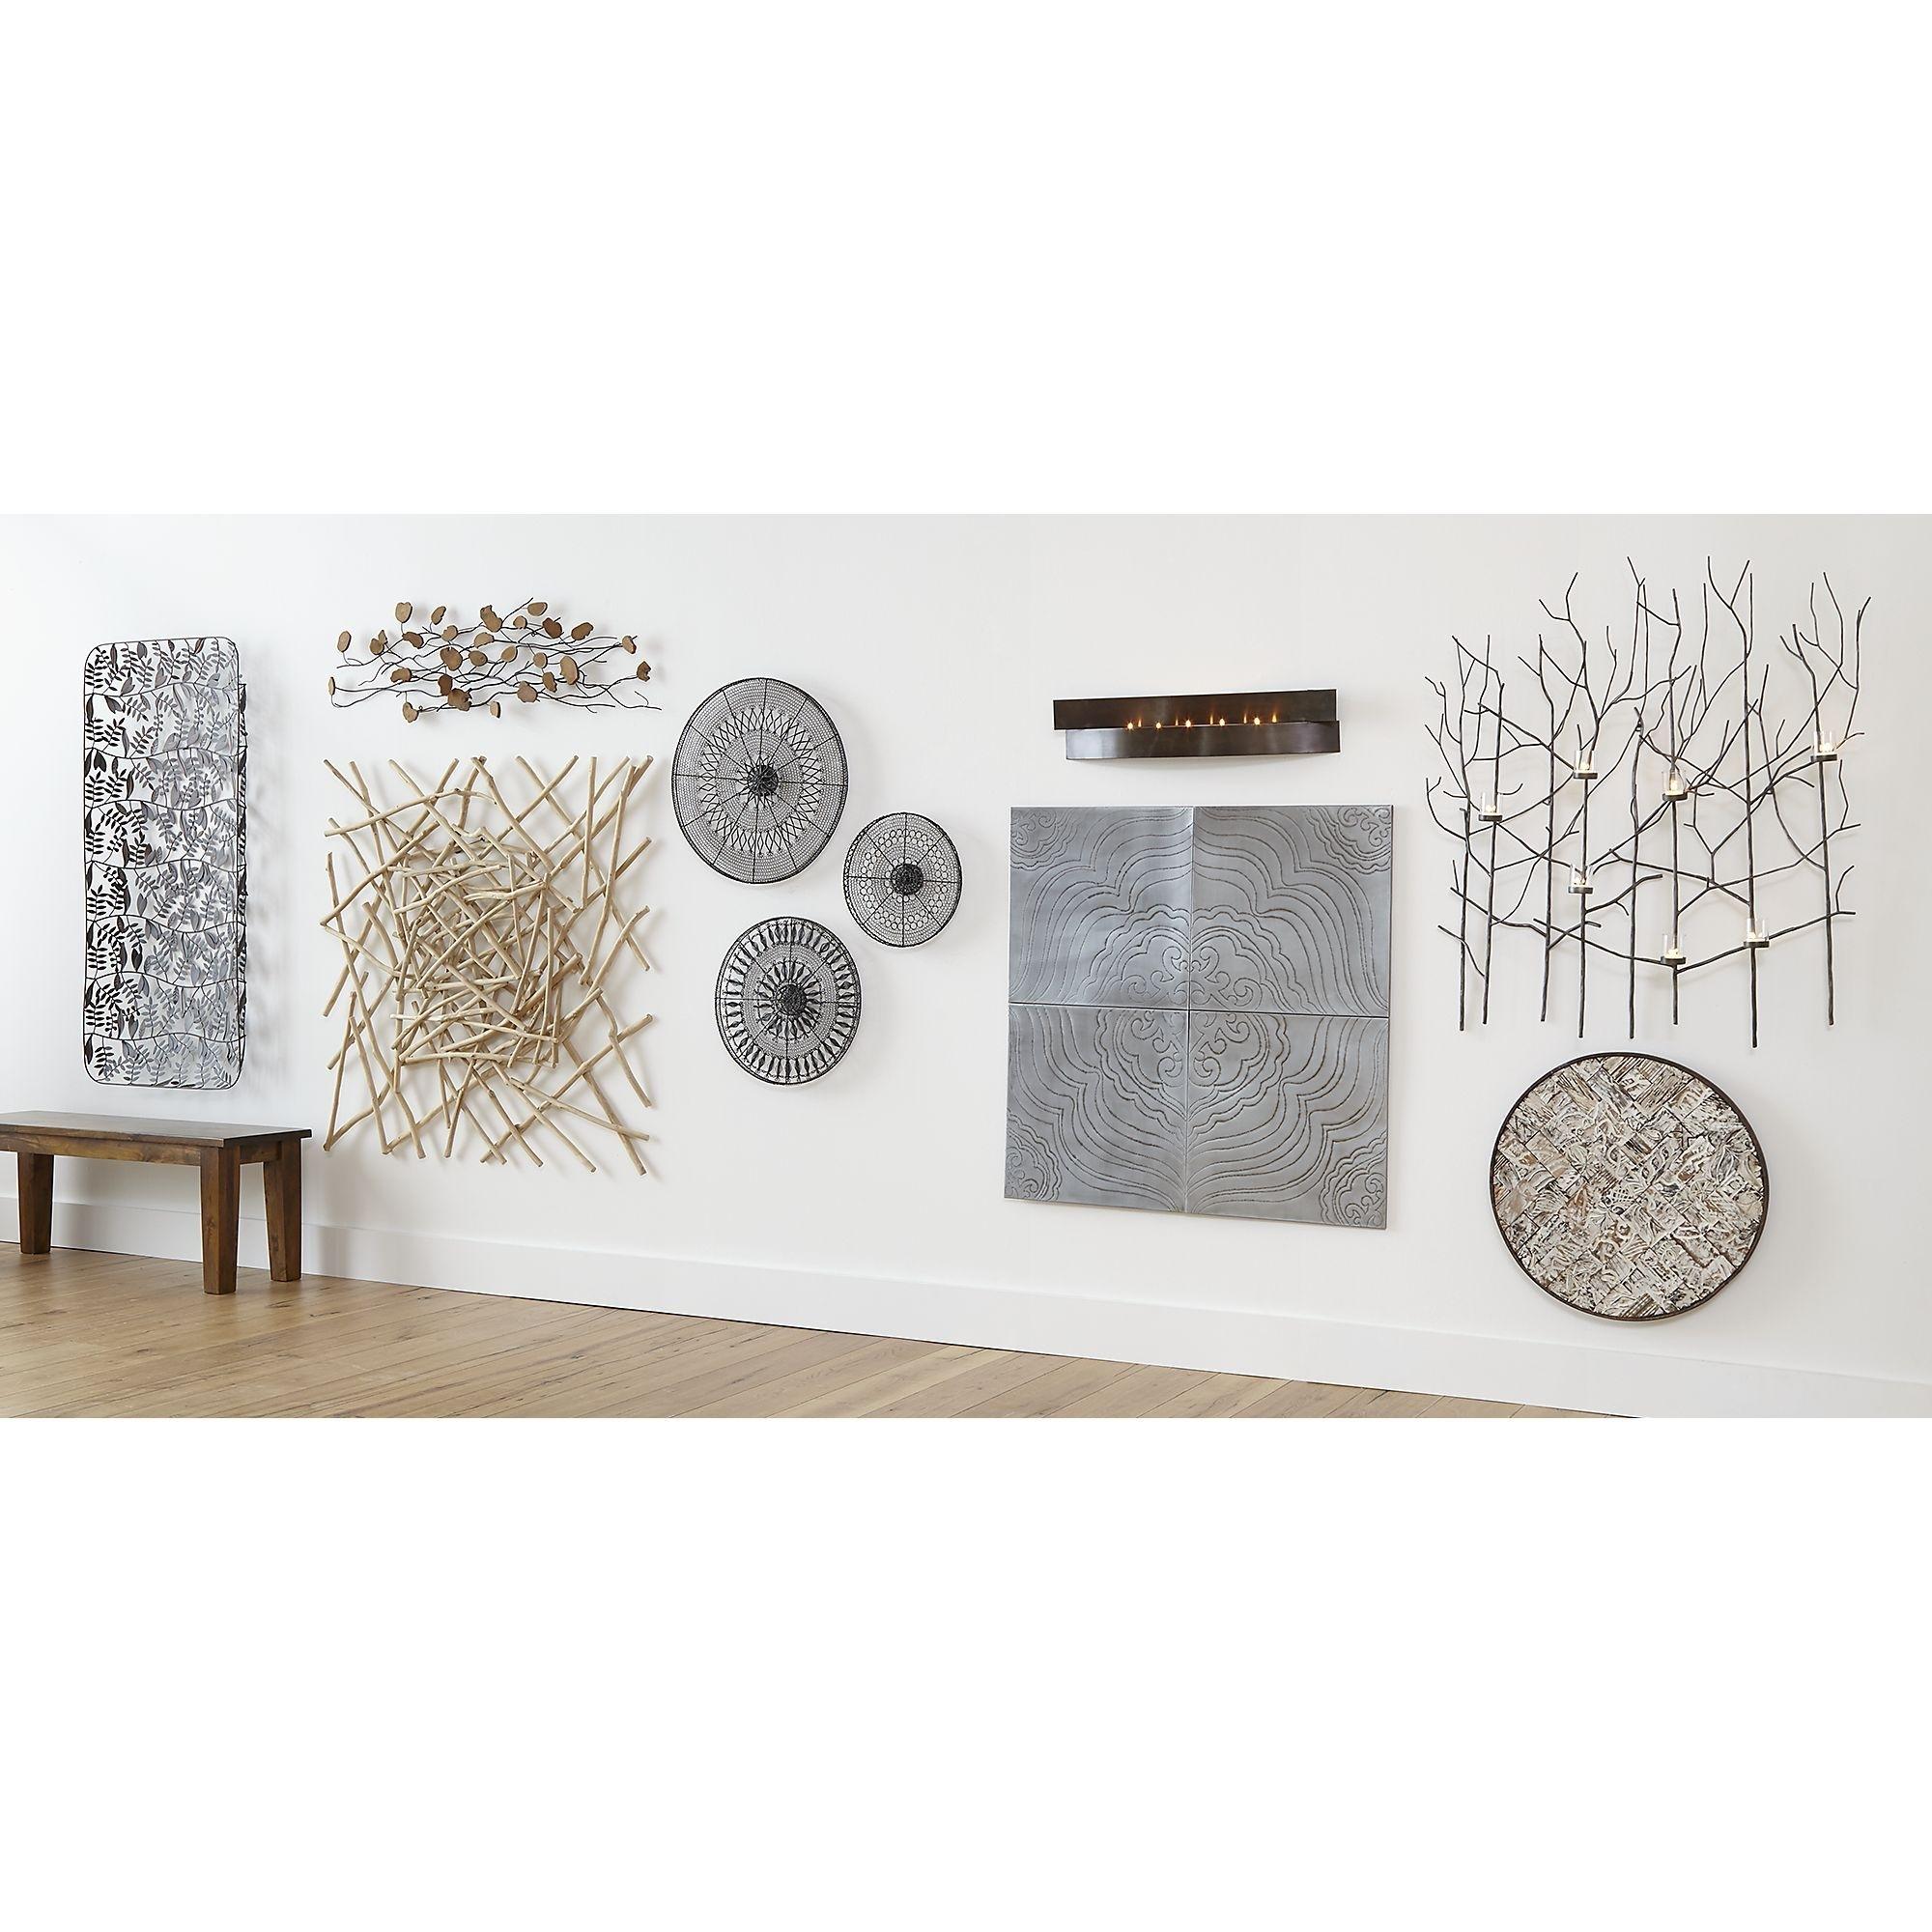 Set Of 4 Jacinto Metal Wall Art | Crate And Barrel | Ideas For The For Newest Crate And Barrel Wall Art (View 14 of 20)